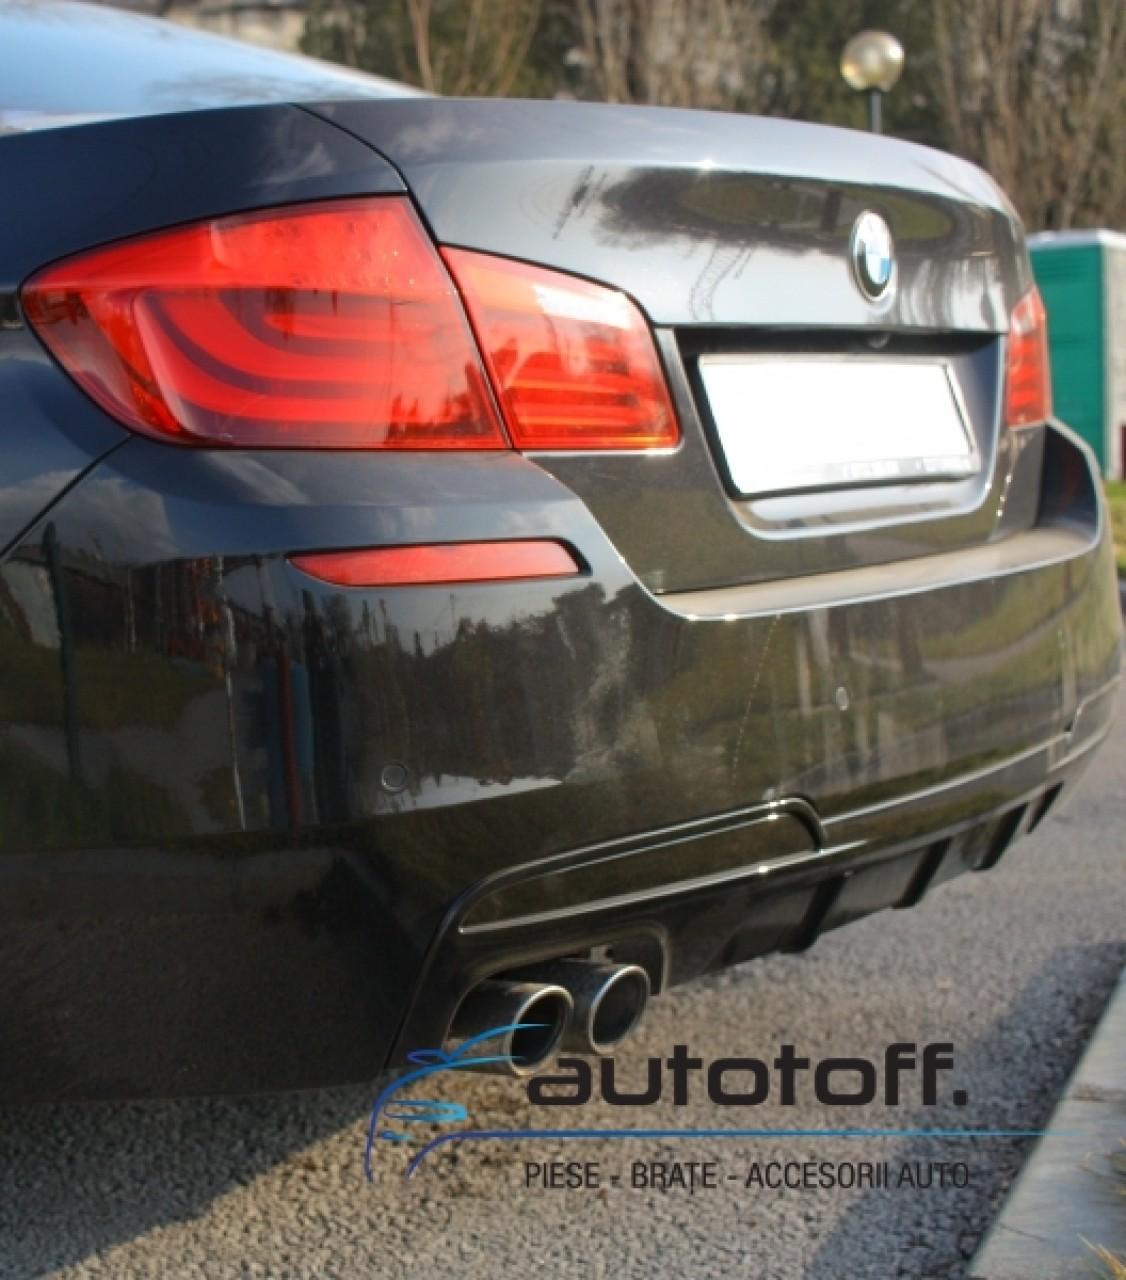 DIFUZOR BARA SPATE BMW SERIA 5 F10 (2011-2013) M-PERFORMANCE DESIGN